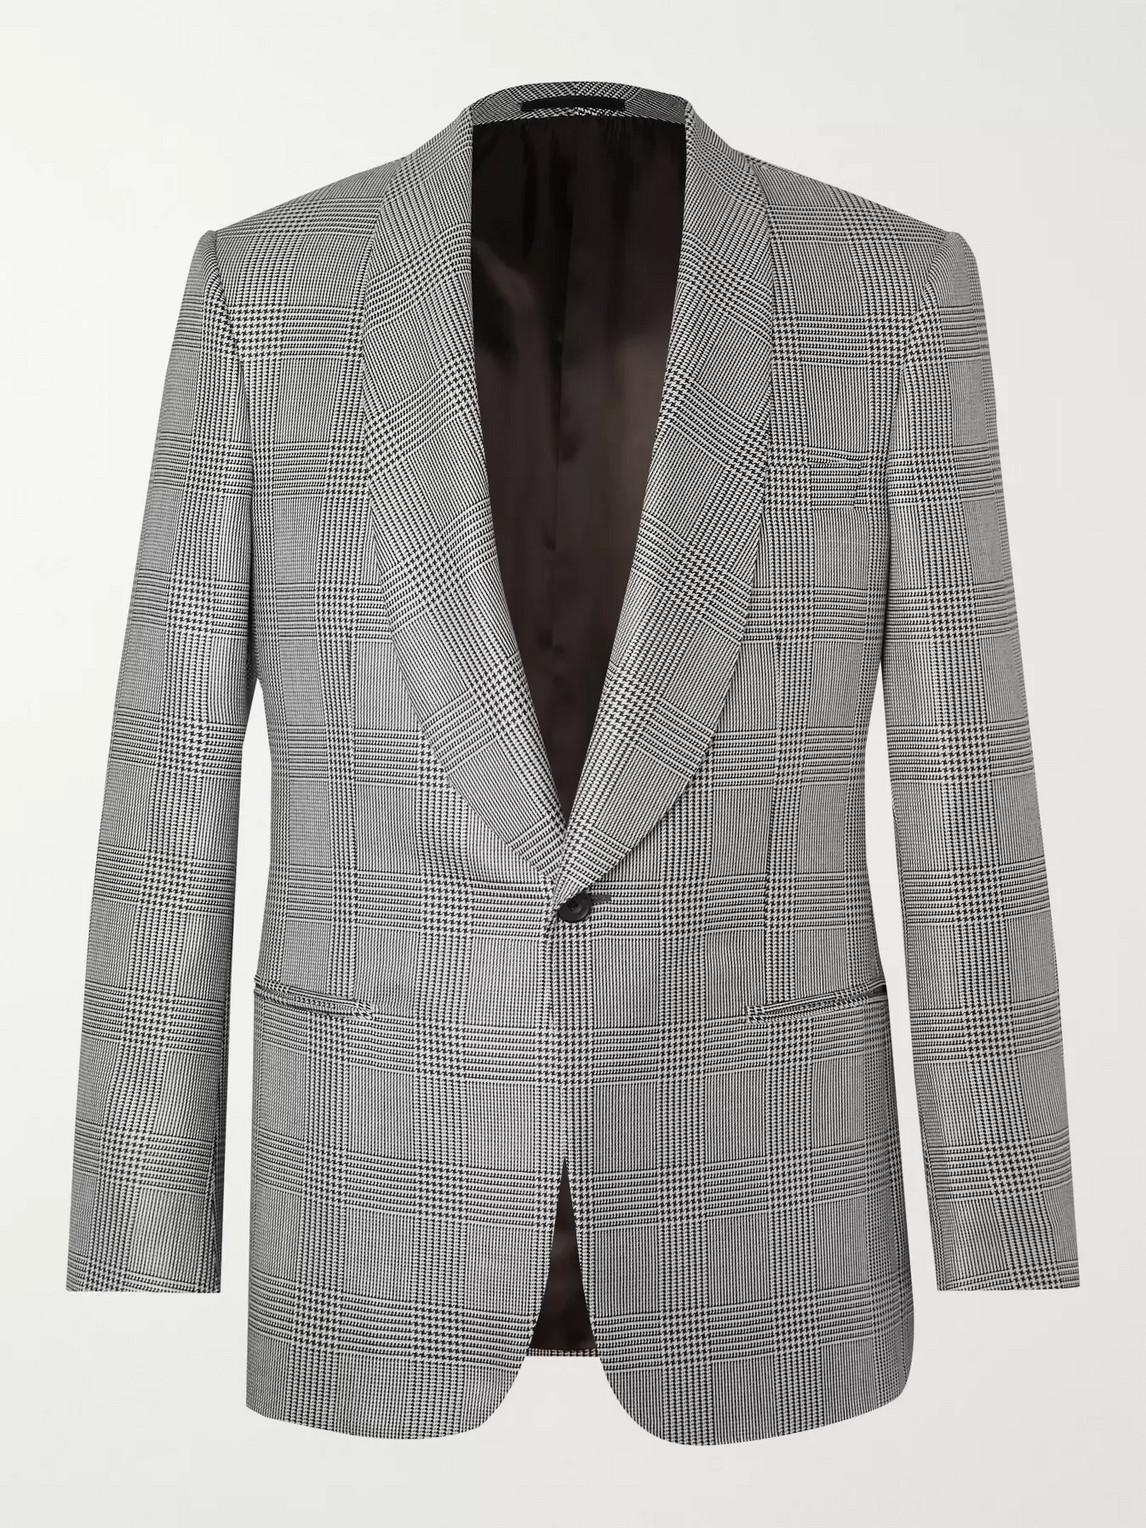 kingsman - black prince of wales checked wool and silk-blend tuxedo jacket - men - black